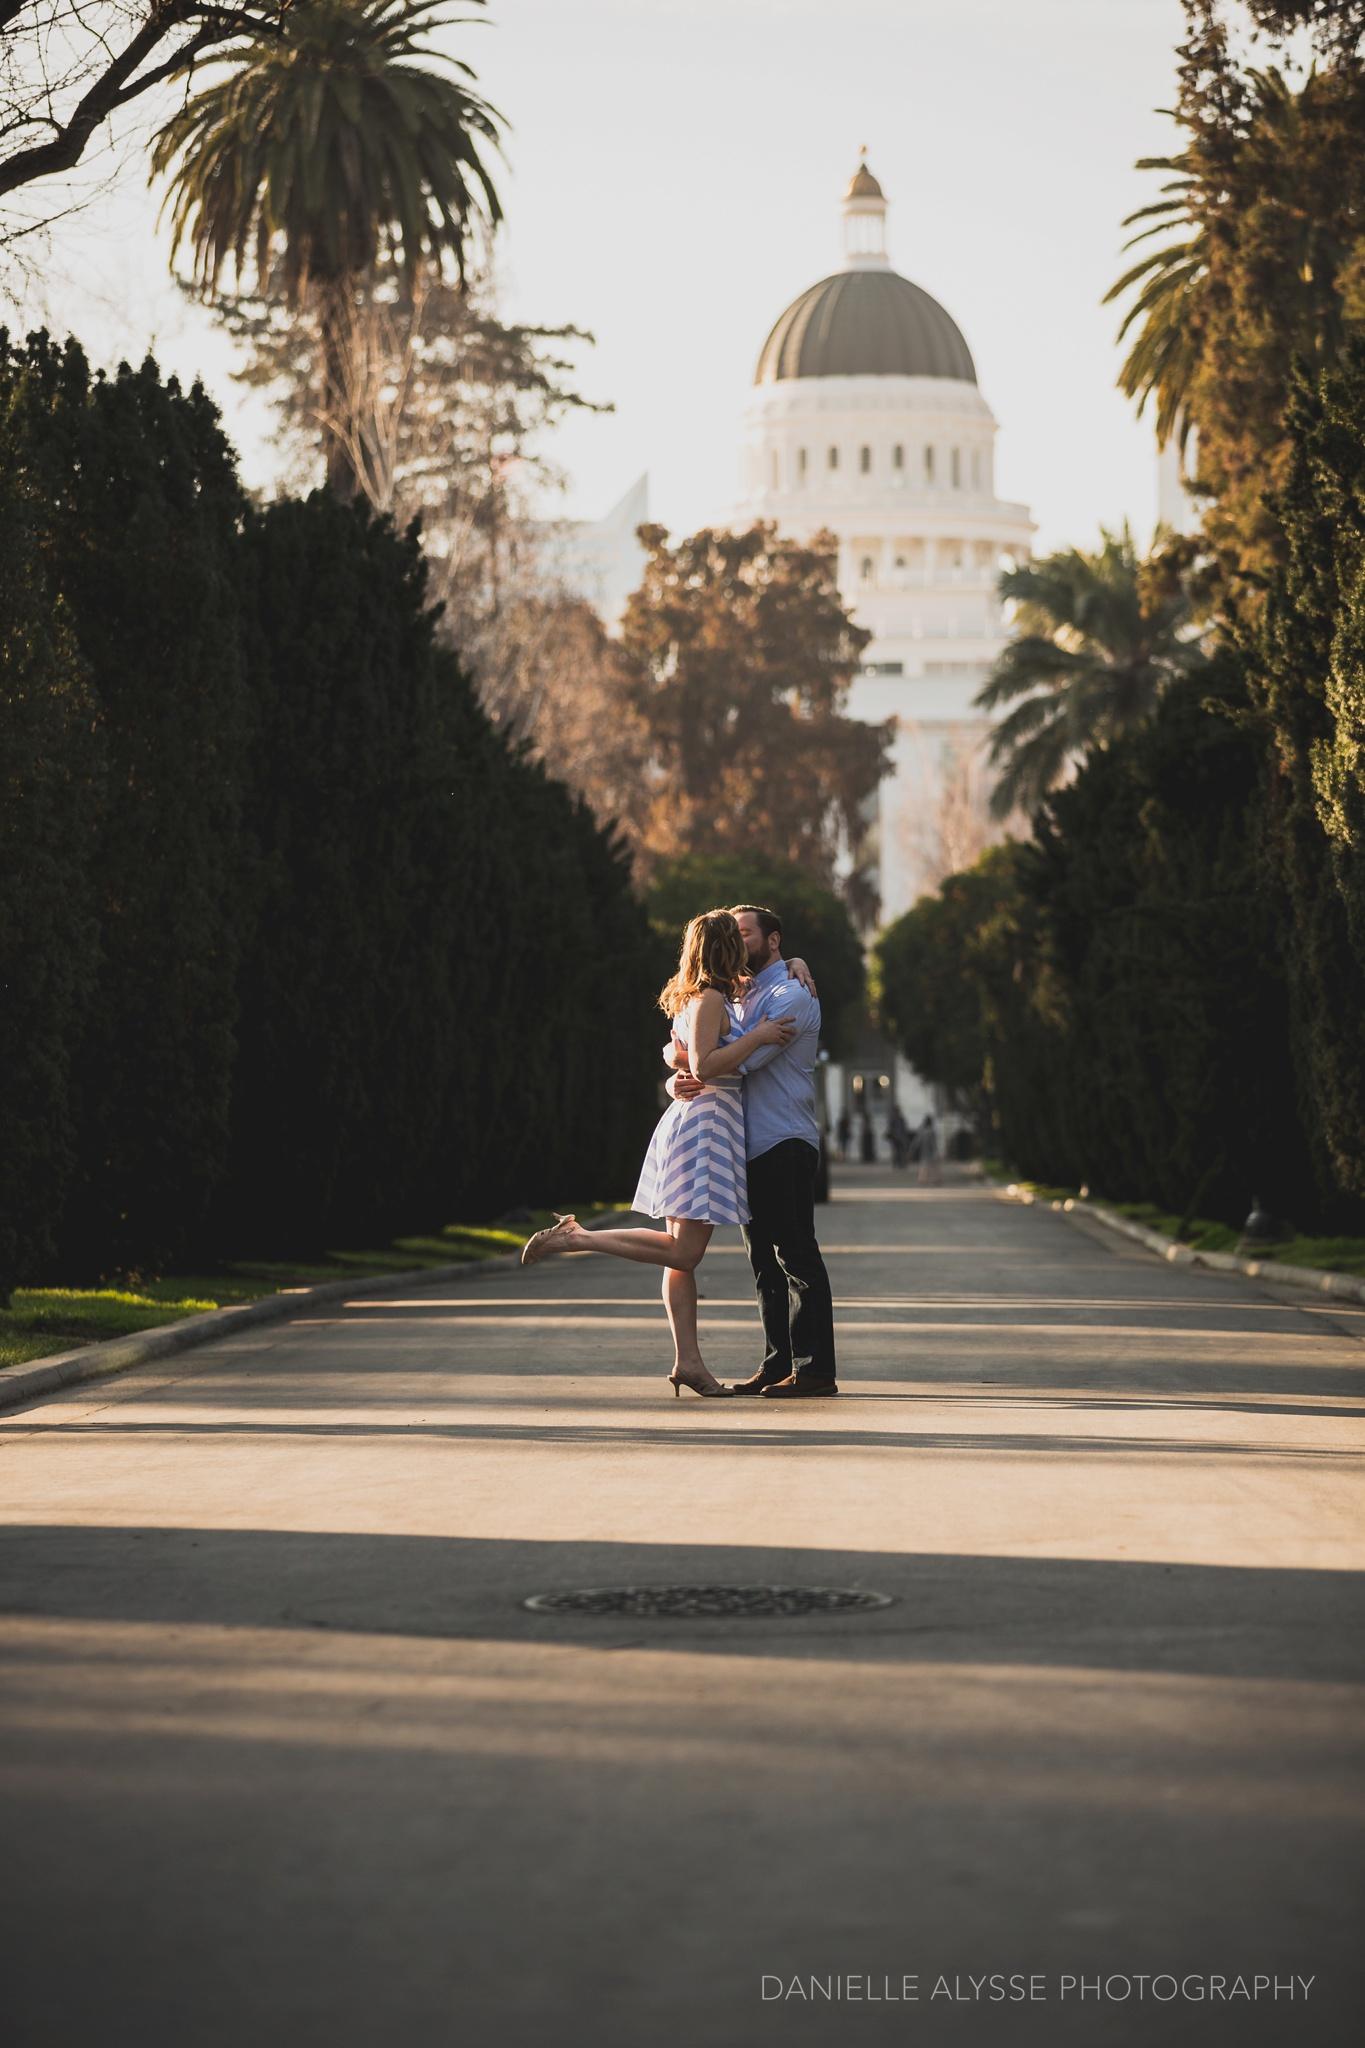 180204_engagement_kristi_state_capitol_downtown_california_danielle_alysse_photography_sacramento_photographer_1_WEB.jpg